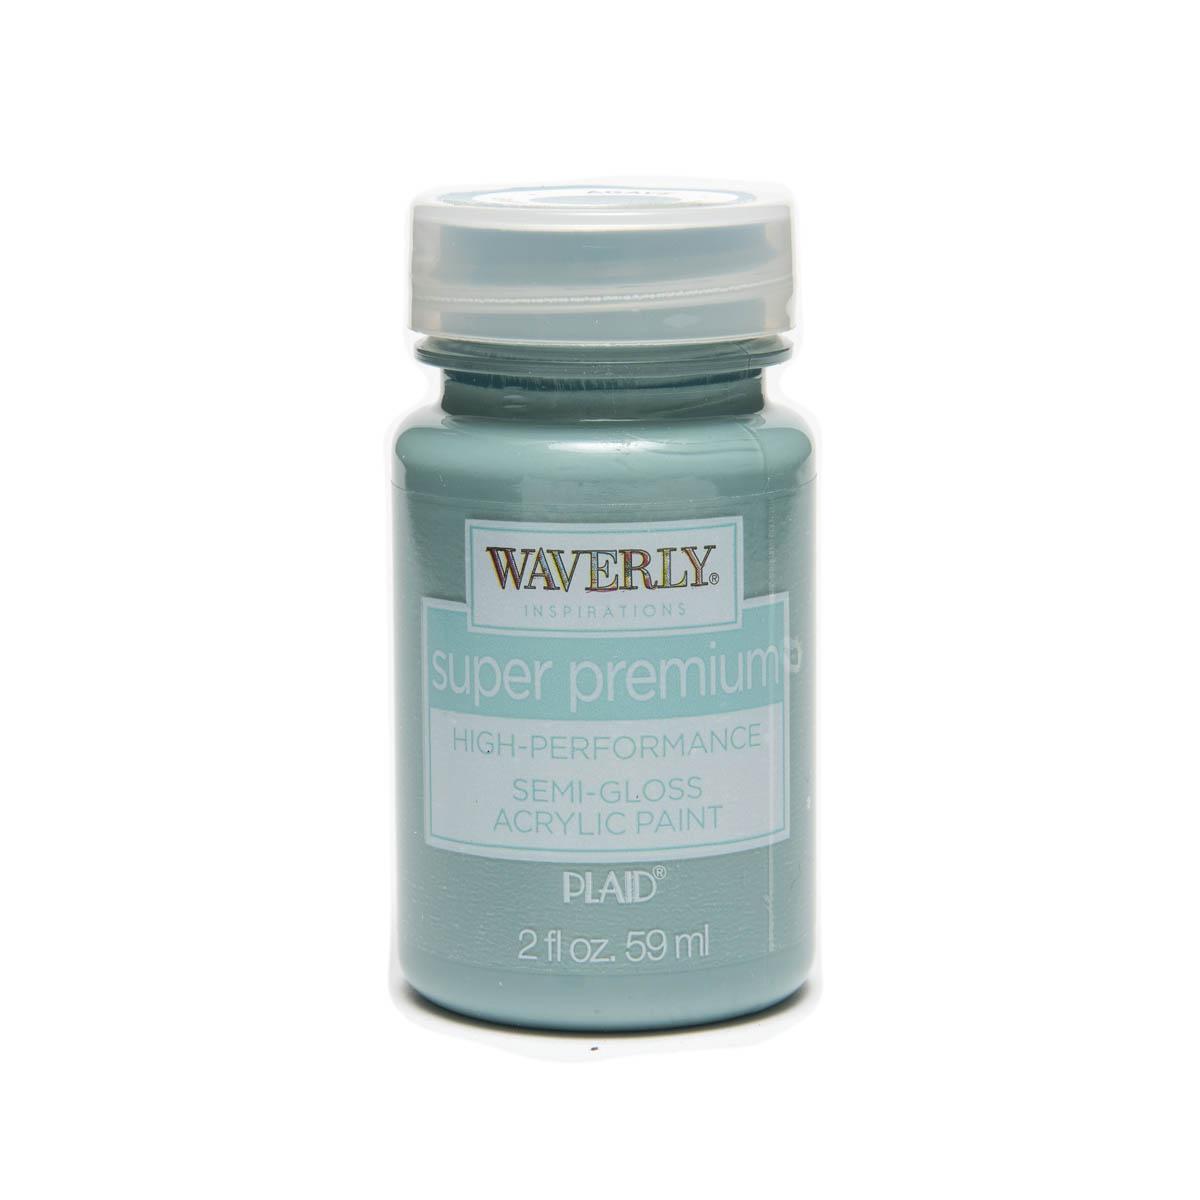 Waverly ® Inspirations Super Premium Semi-Gloss Acrylic Paint - Agave, 2 oz.